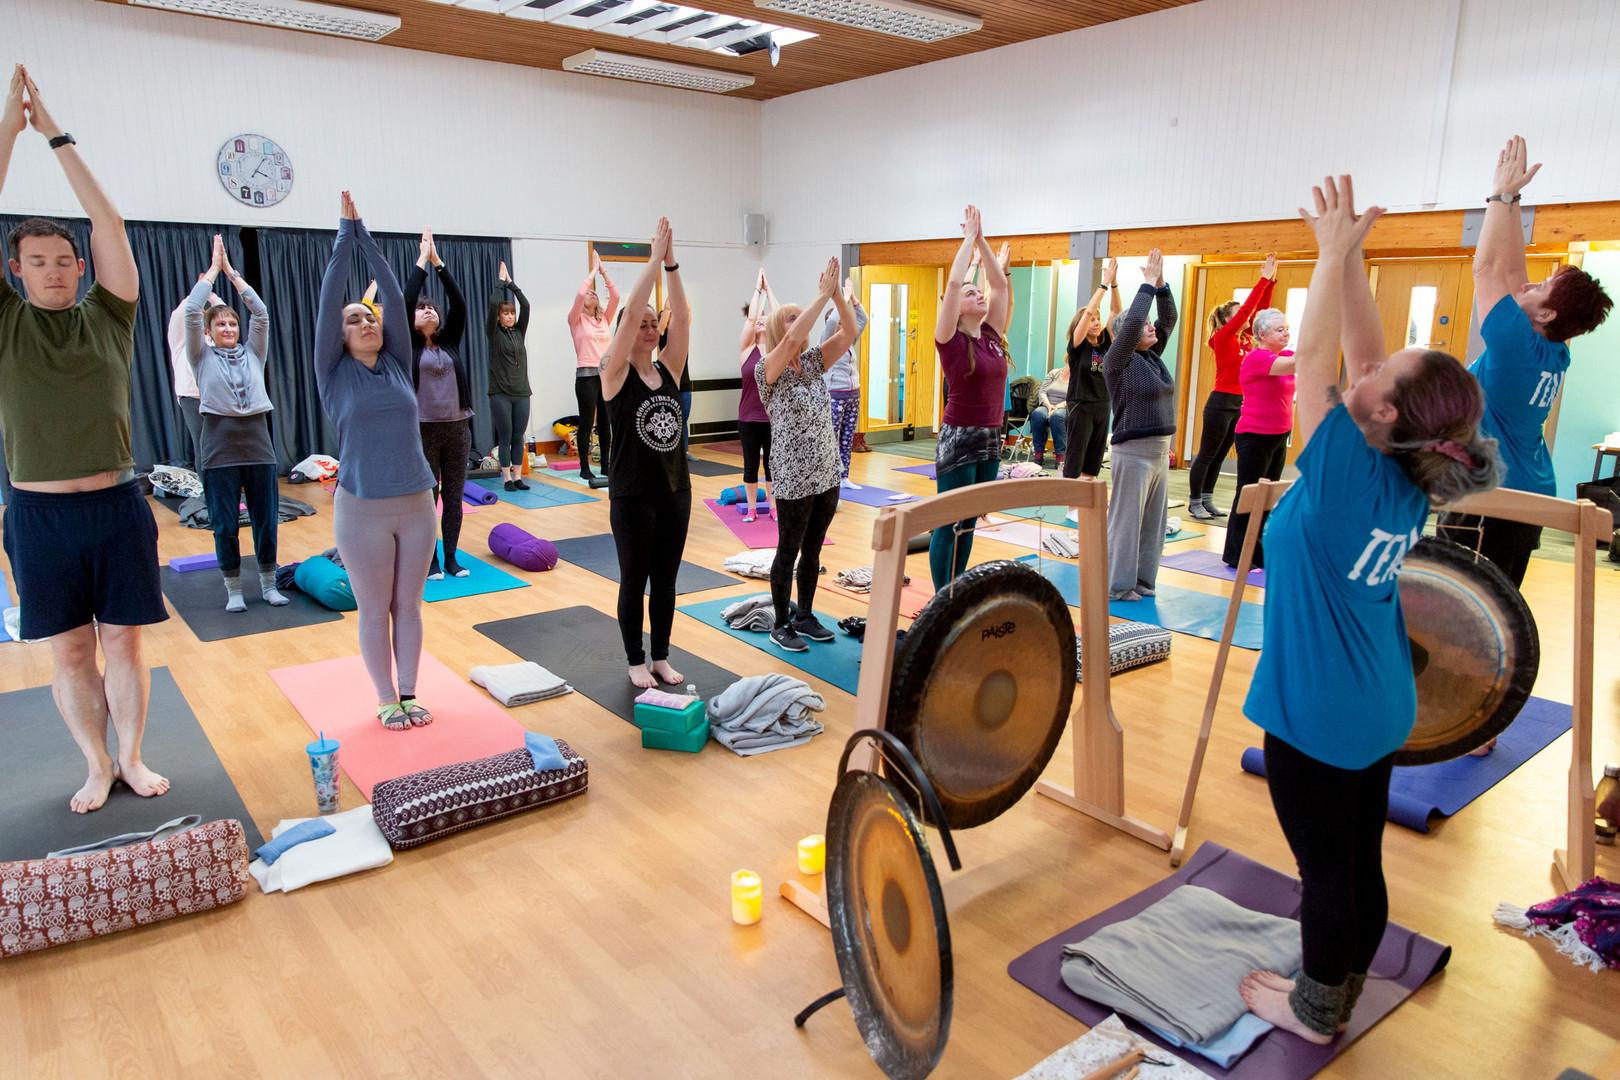 yogathon-feb-2020-6.jpg